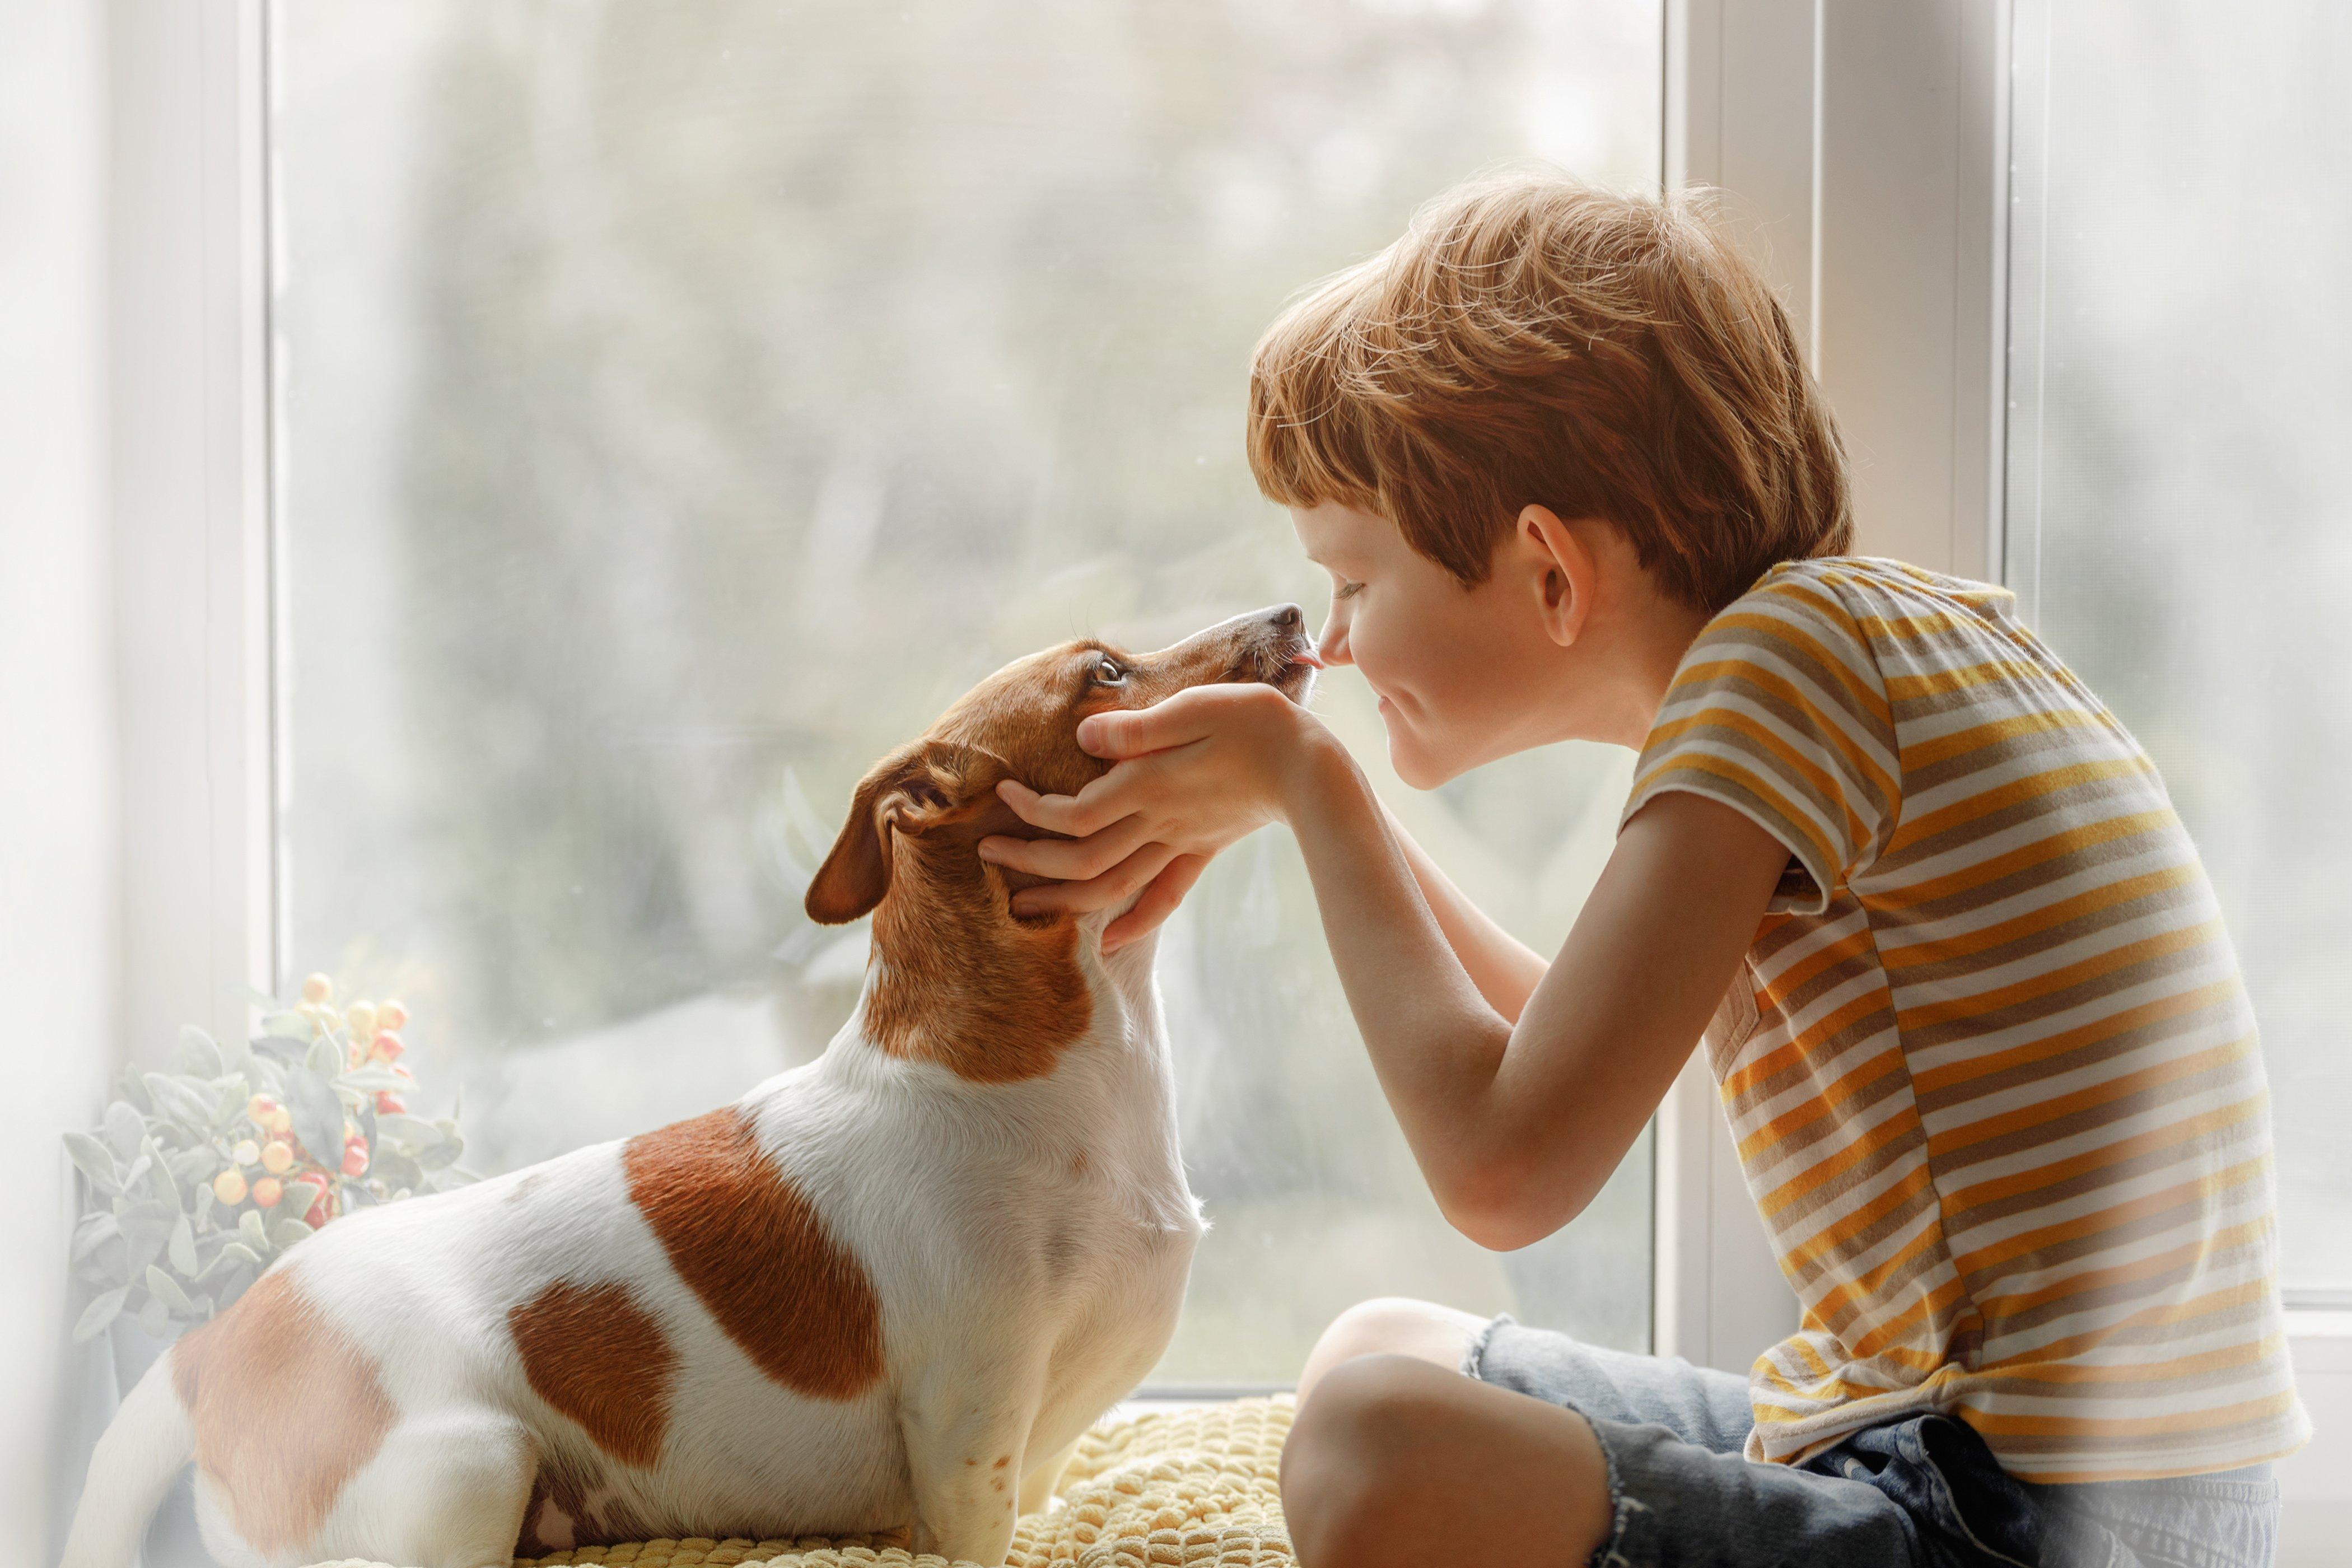 Niño besa a un perro. Fuente: Shutterstock